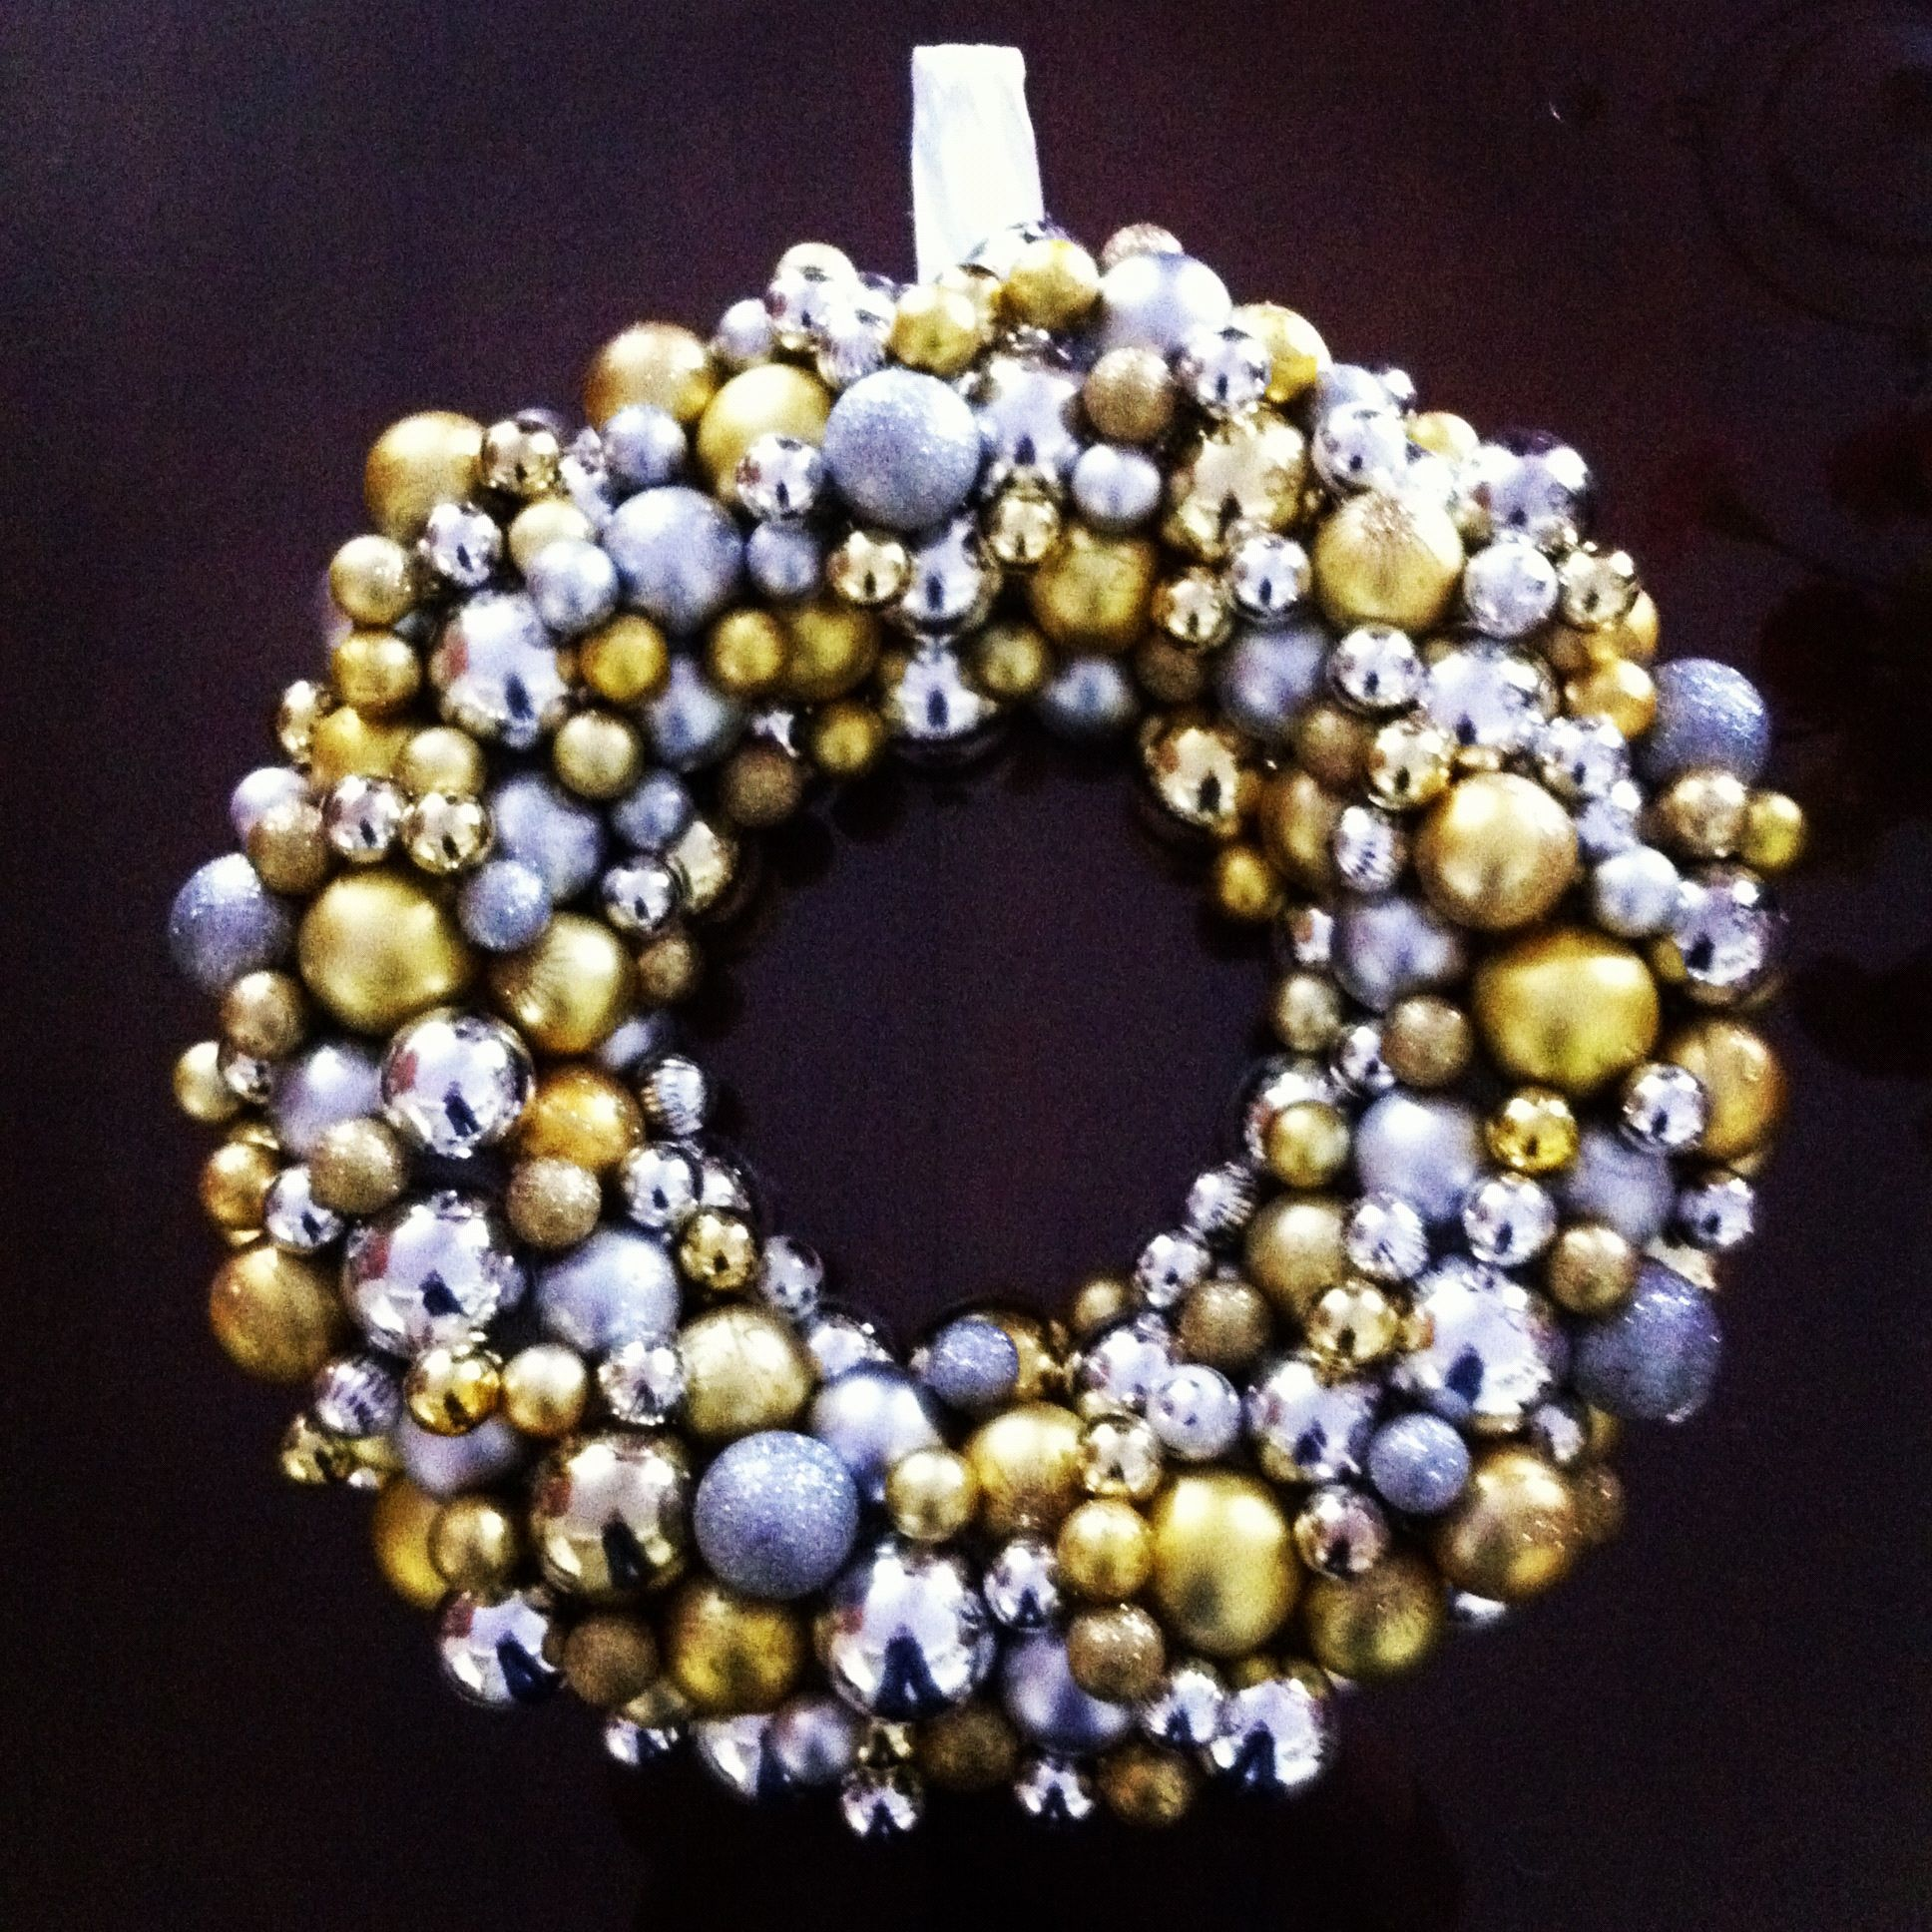 Christmas wreath Made this wreath using plastic Christmas